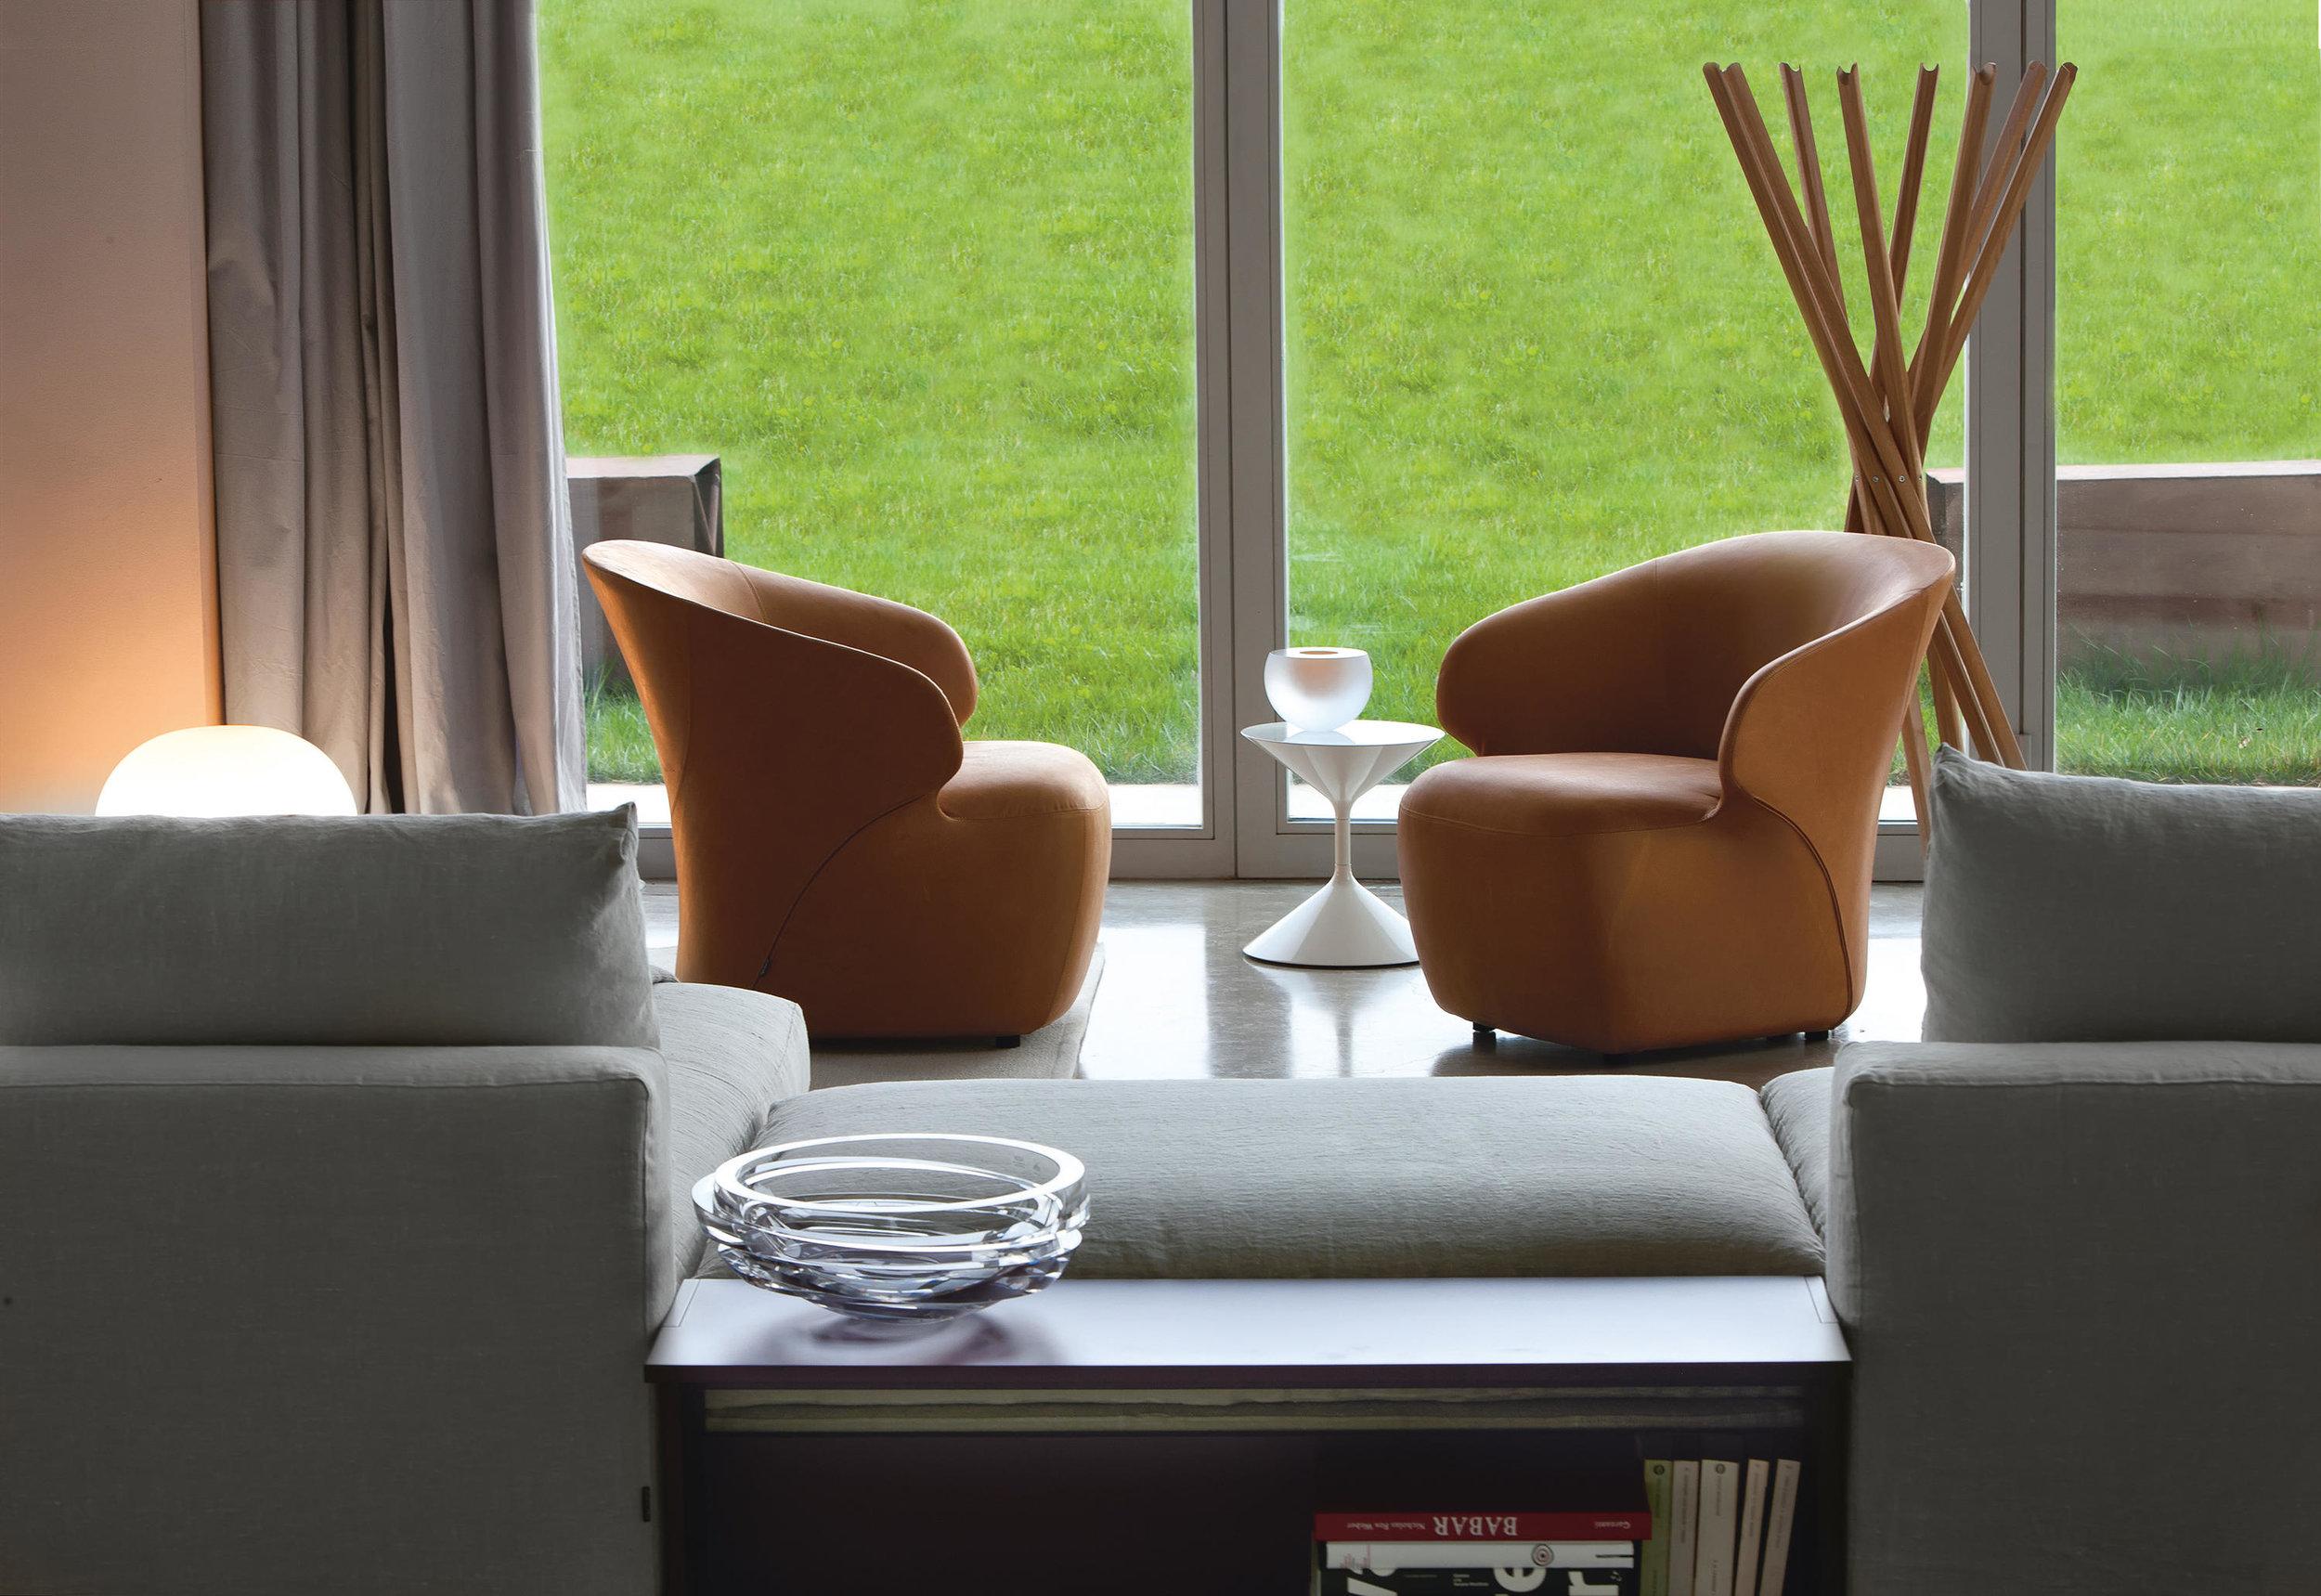 arom-armchair-872-1-ig-b (1).jpg